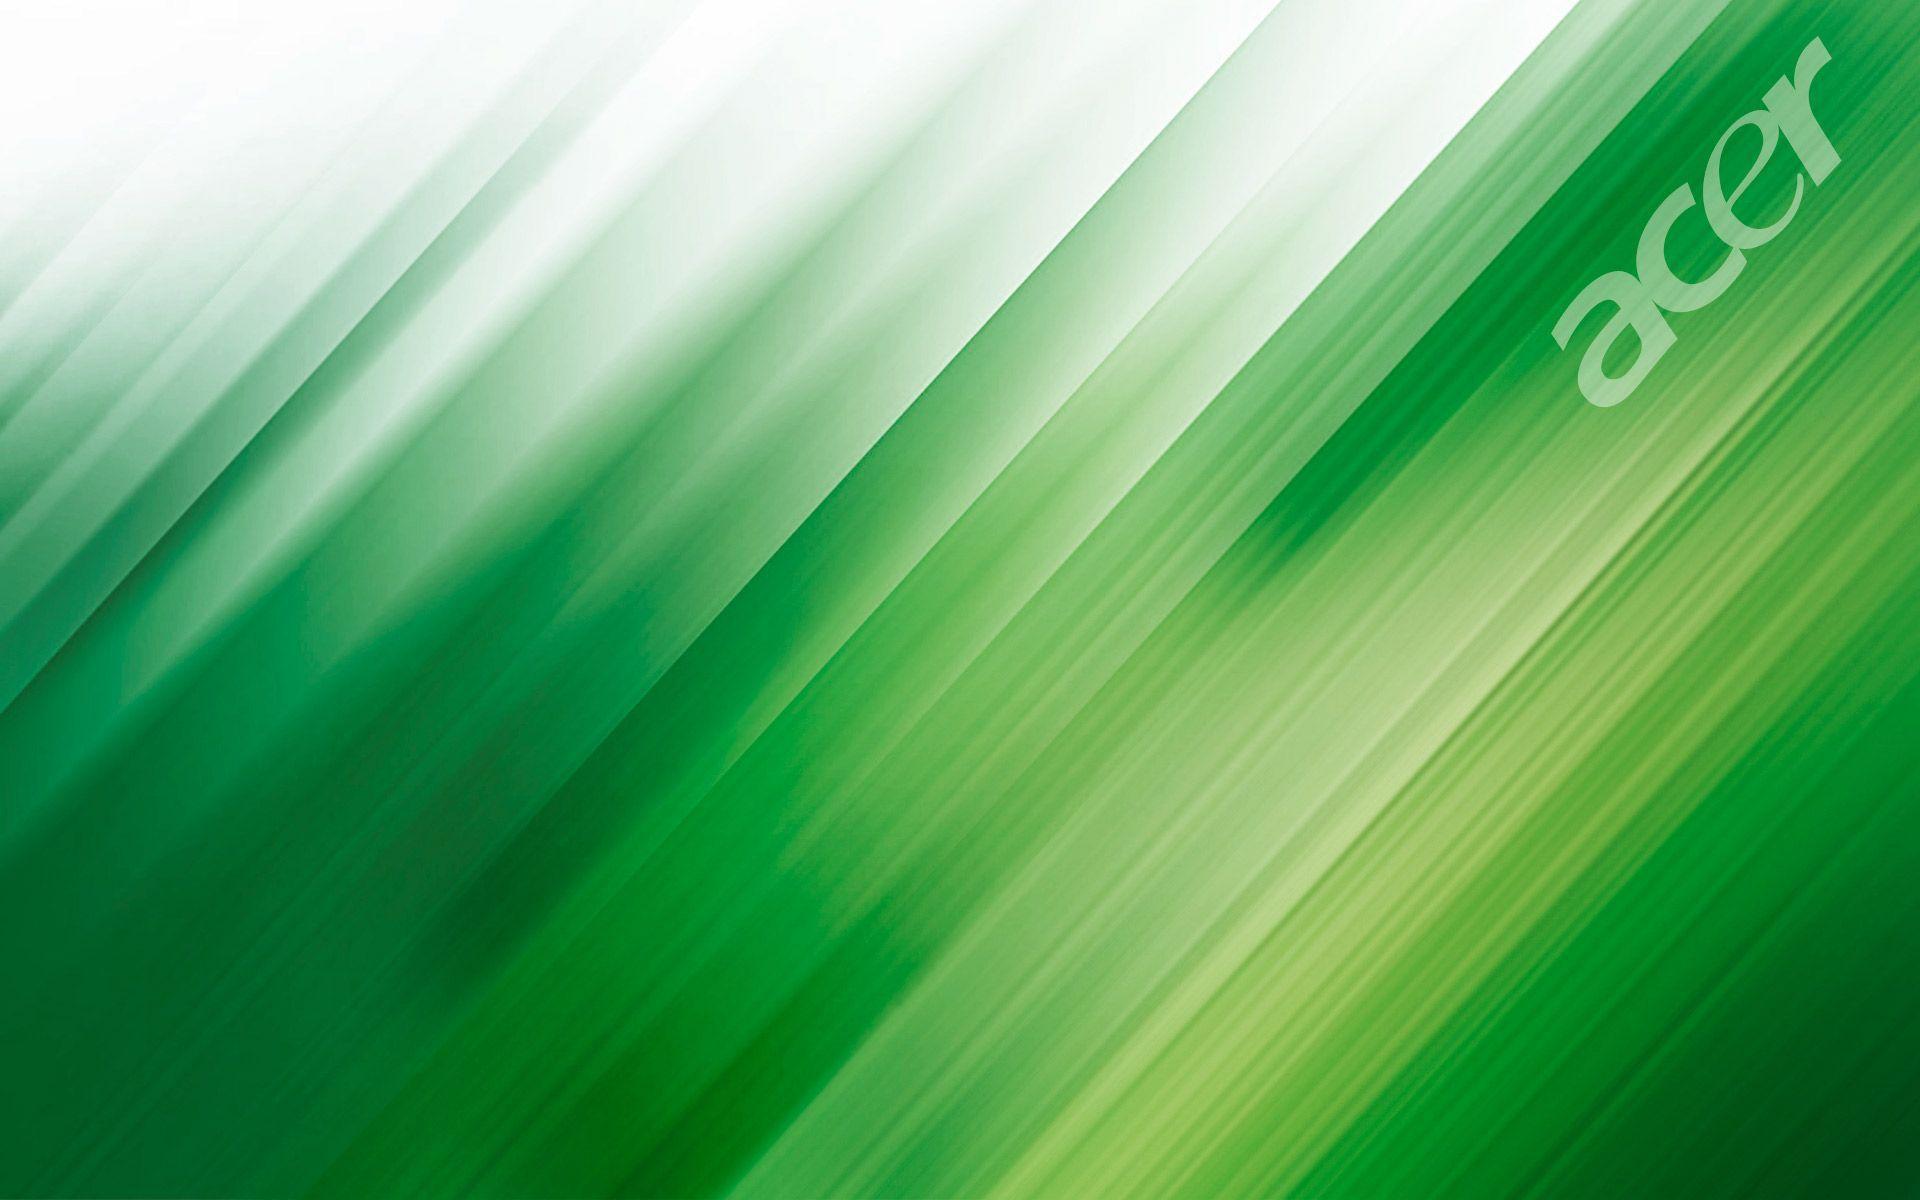 Free Acer Wallpaper